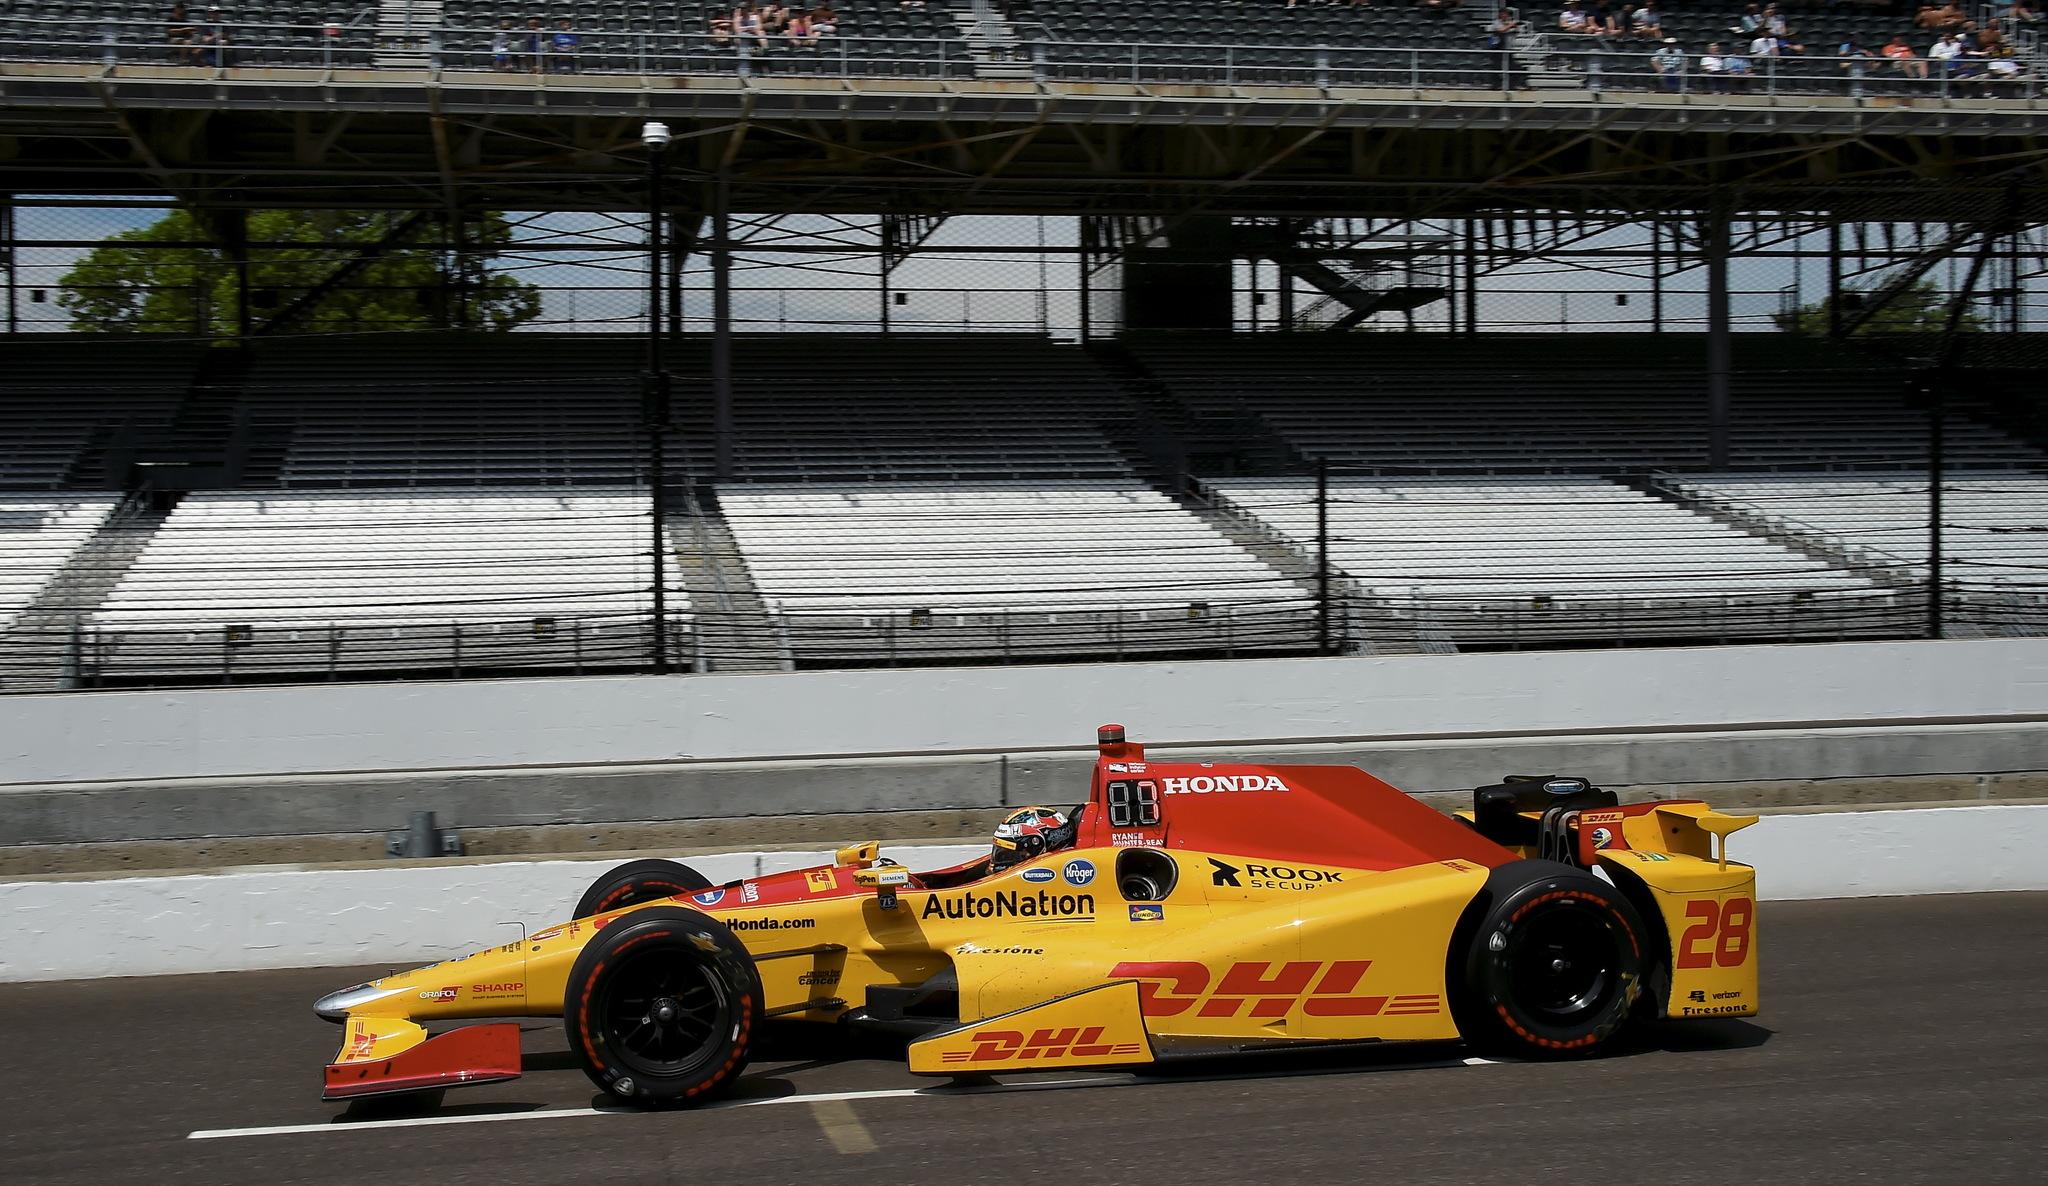 Fernando lt;HIT gt;Alonso lt;/HIT gt; (ES) Mclaren Andretti Indy 500 en el circuito de lt;HIT gt;Indianápolis lt;/HIT gt; Speedway. viernes 26 de mayo de 2017 *** Local Caption *** RUBIO